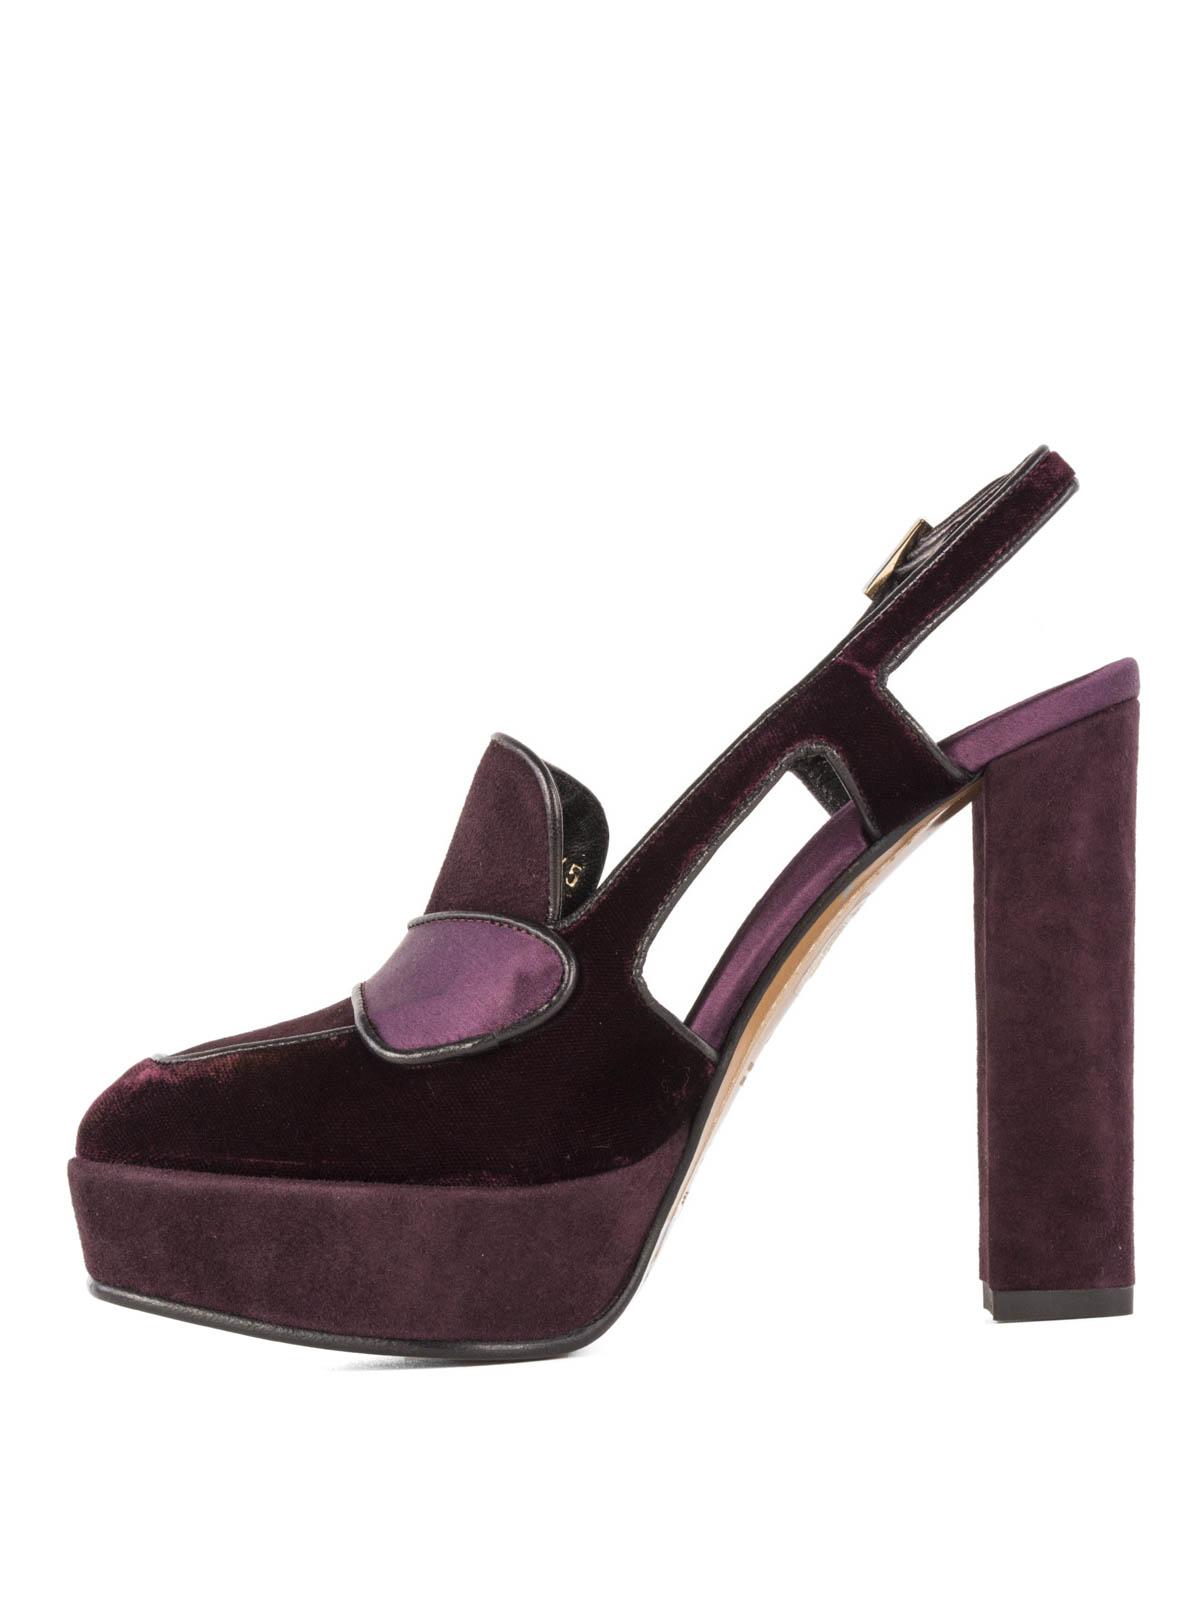 8bd5dd036294 Etro - Suede and velvet platform shoes - court shoes - 133452599400